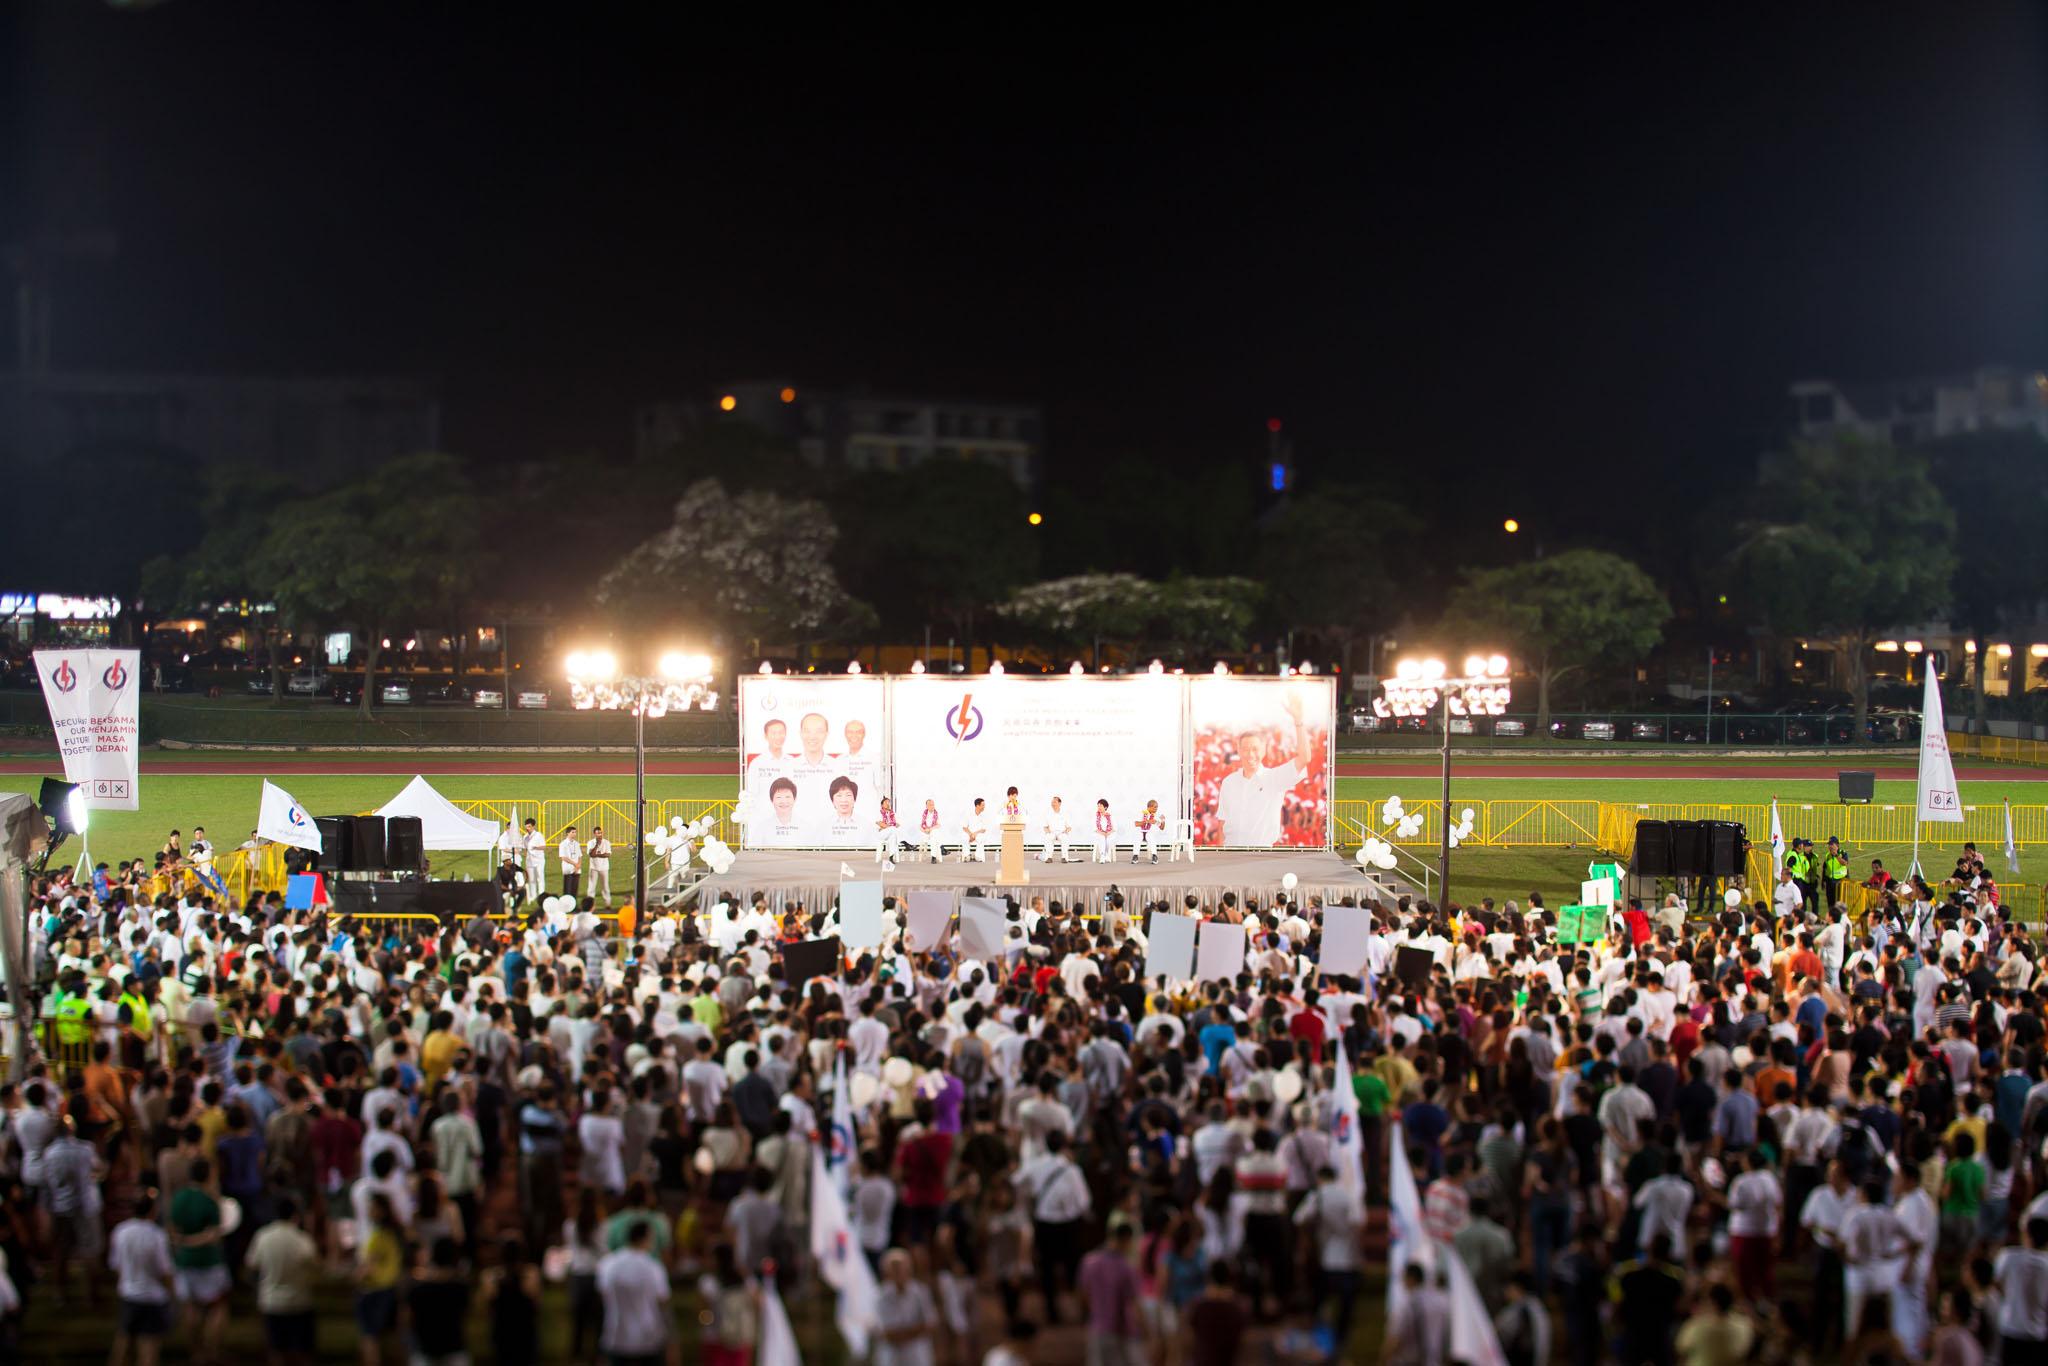 singapore-commercial-photographer-editorial-documentary-tiltshift-singaplural-zakaria-zainal-04.jpg